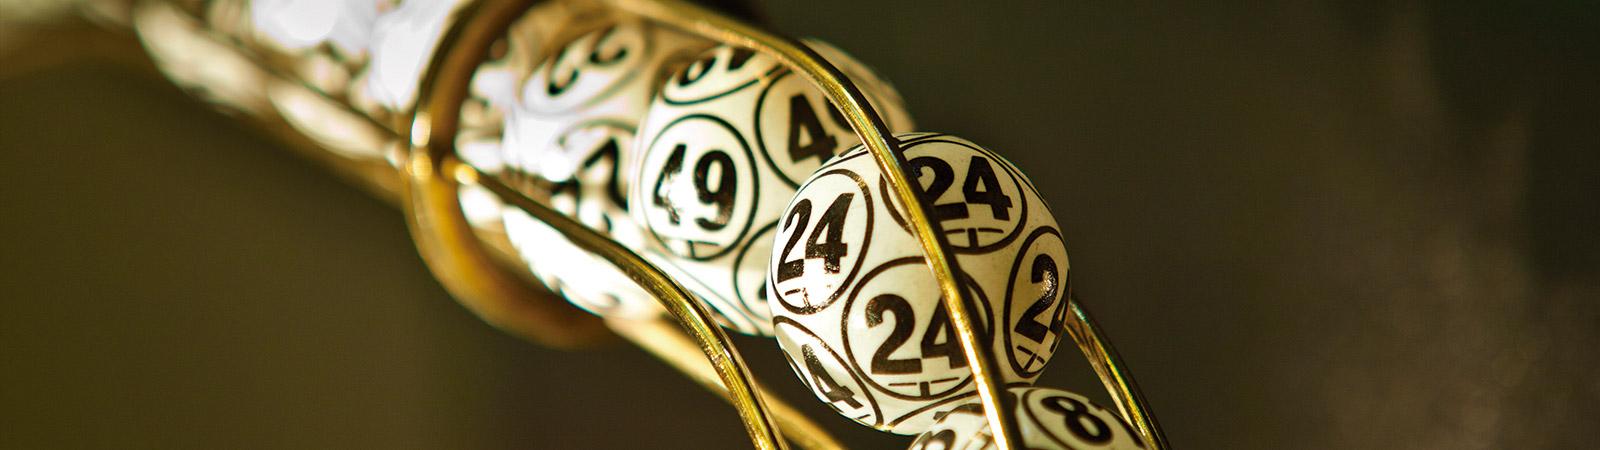 254 betting site